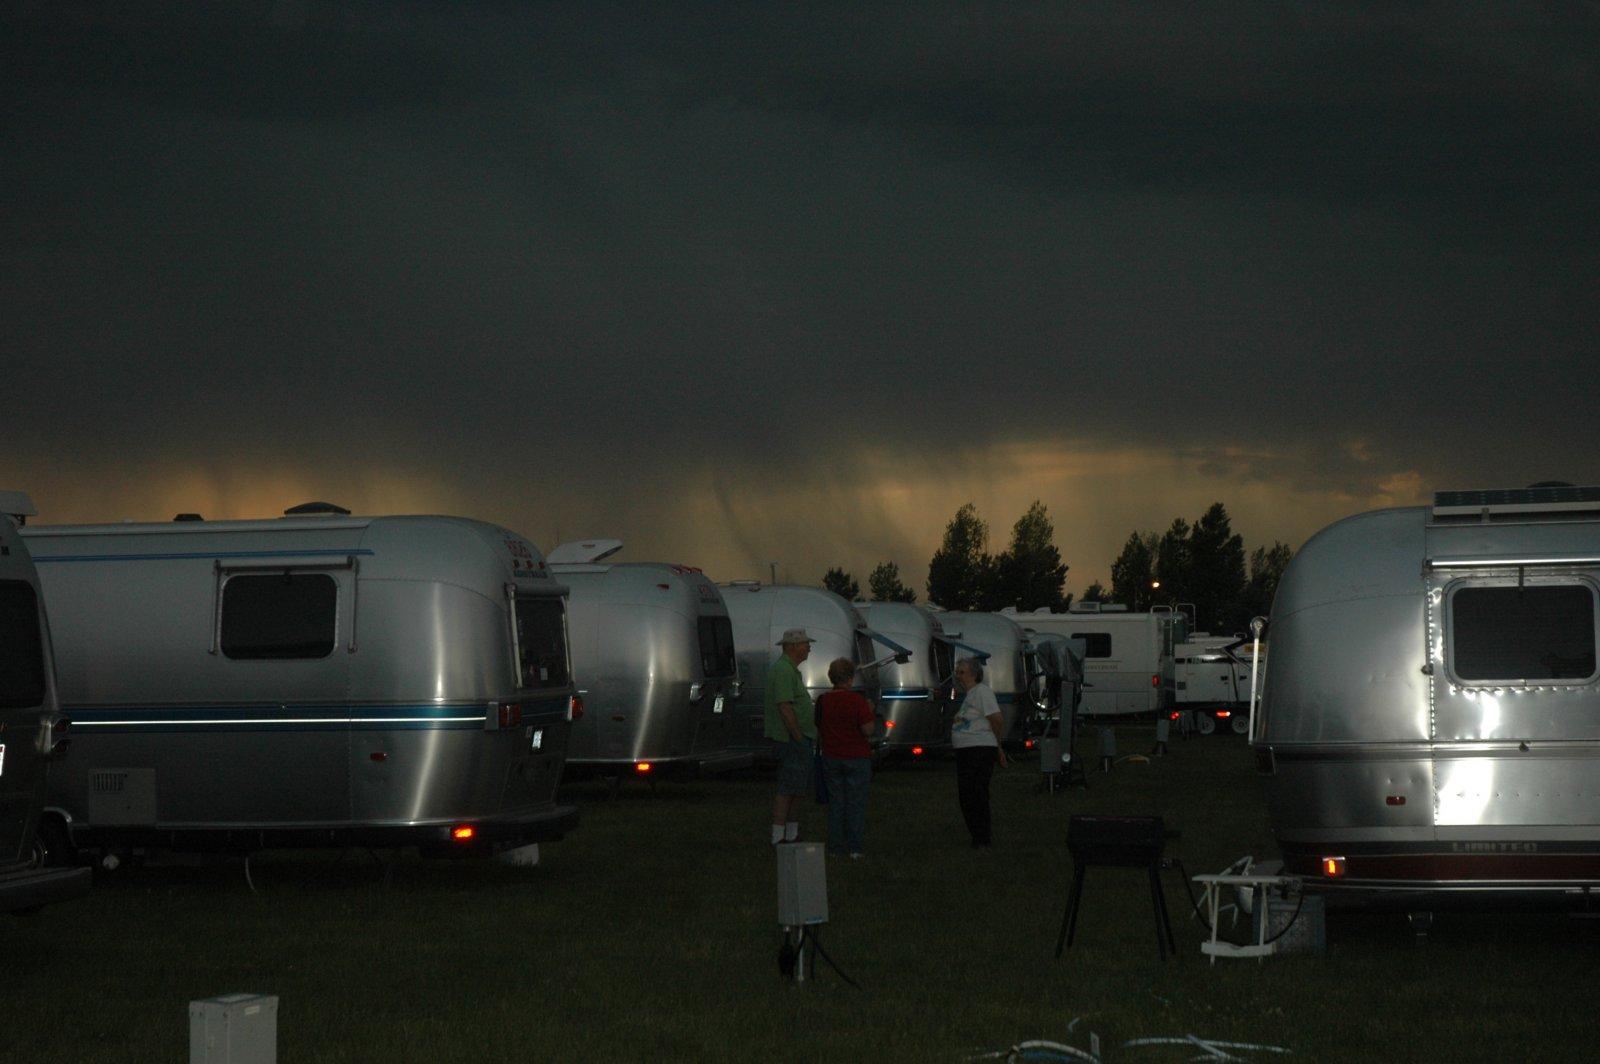 Click image for larger version  Name:Bozeman at Night.jpg Views:87 Size:156.5 KB ID:68390